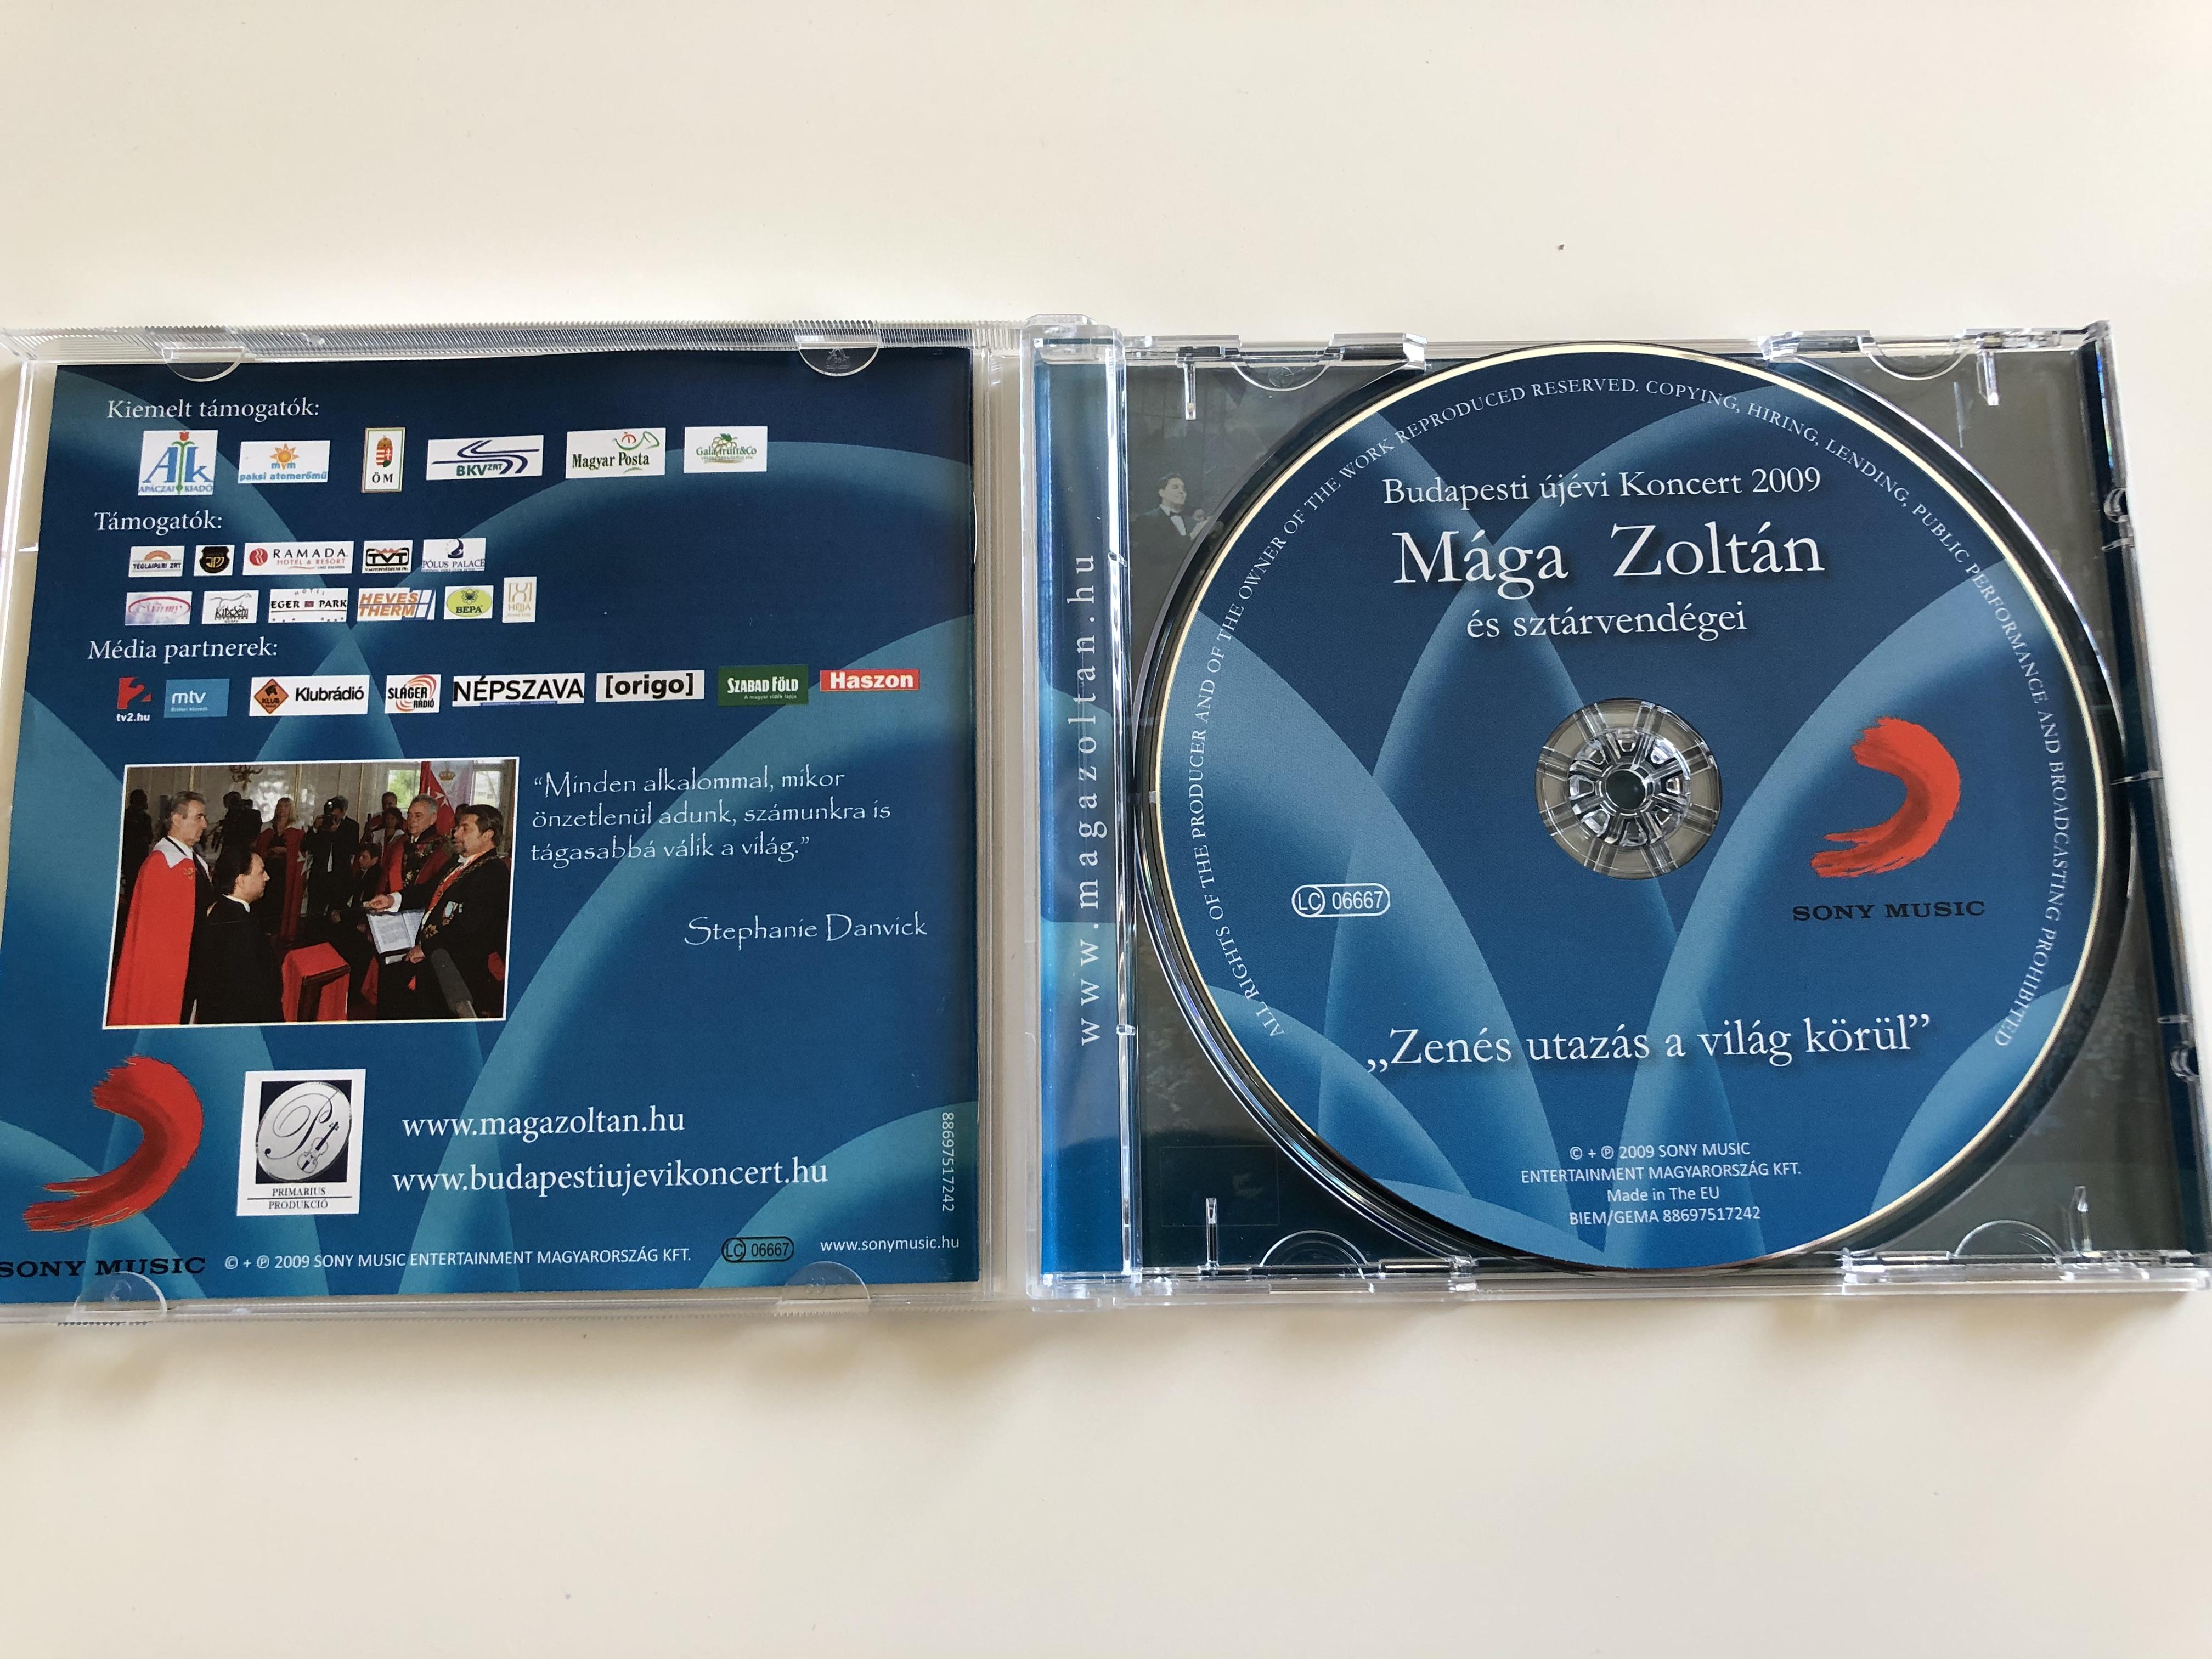 m-ga-zolt-n-budapesti-j-vi-koncert-2009-zen-s-utaz-s-a-vil-g-k-r-l-sony-music-entertainment-m-ga-zolt-n-s-szt-rvend-gei-audio-cd-2009-3-.jpg